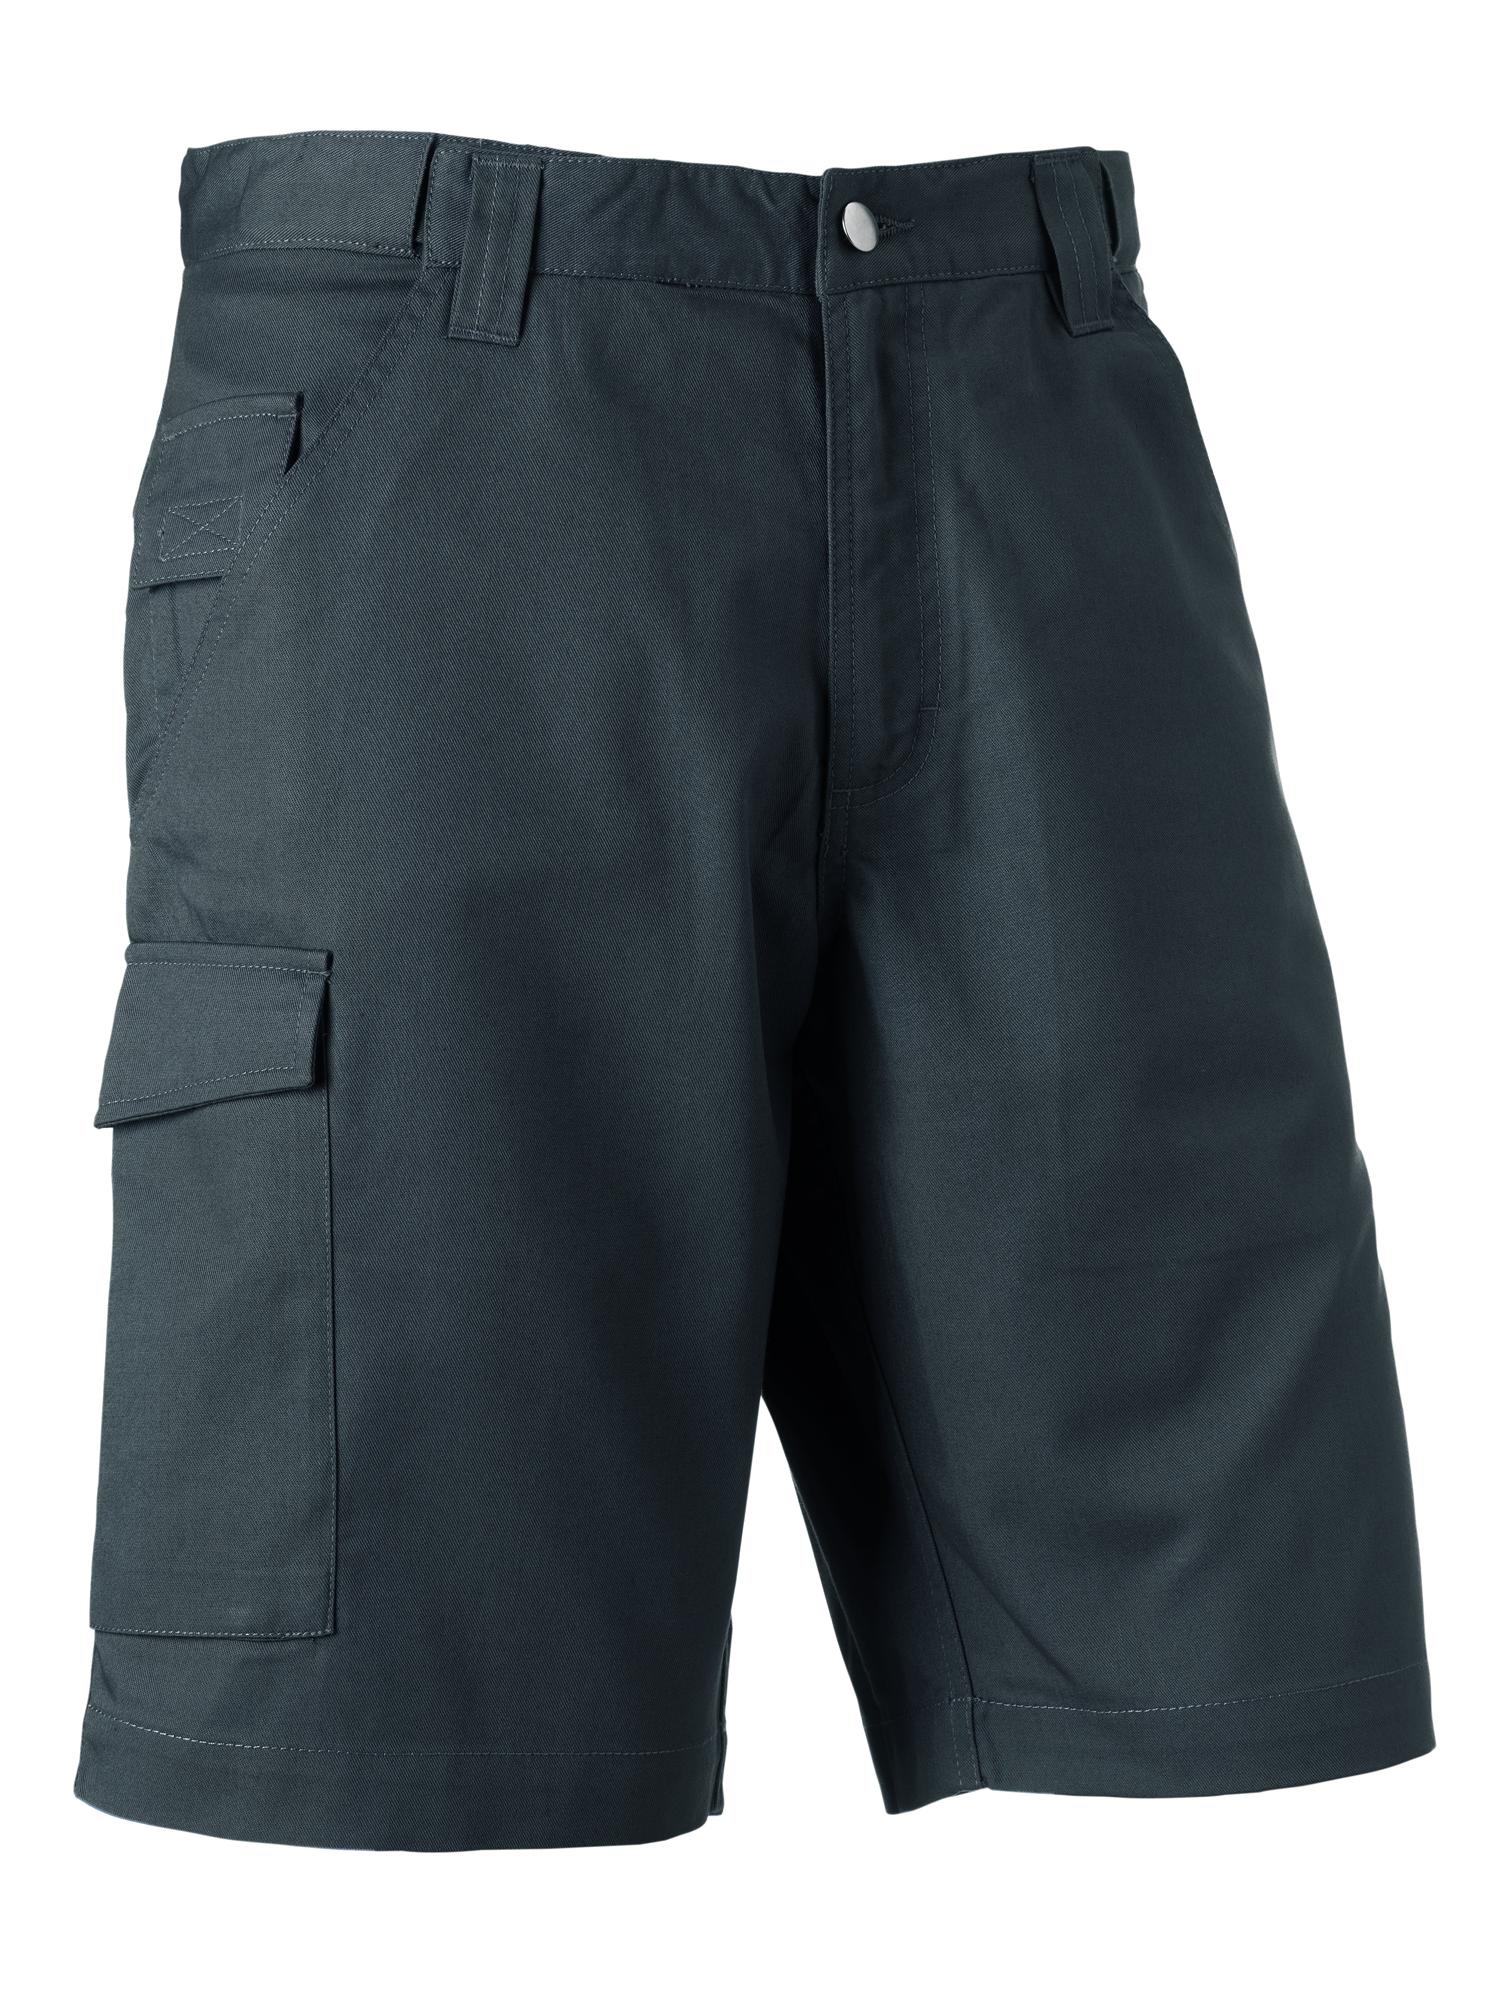 Polycotton Twill Shorts - Convoy Grey - 42